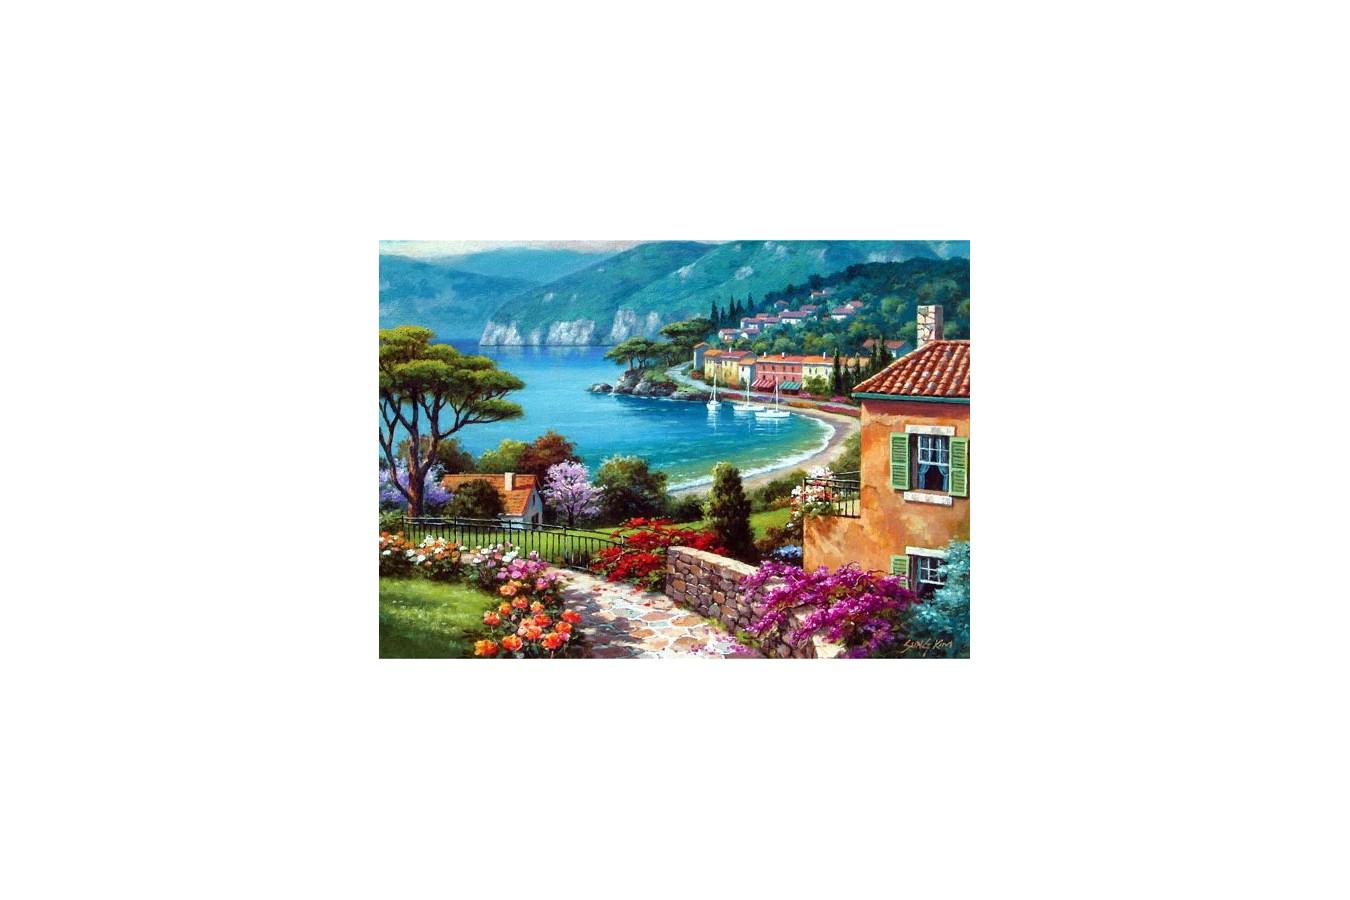 Puzzle Anatolian - Lakeside, 1500 piese (4547) imagine